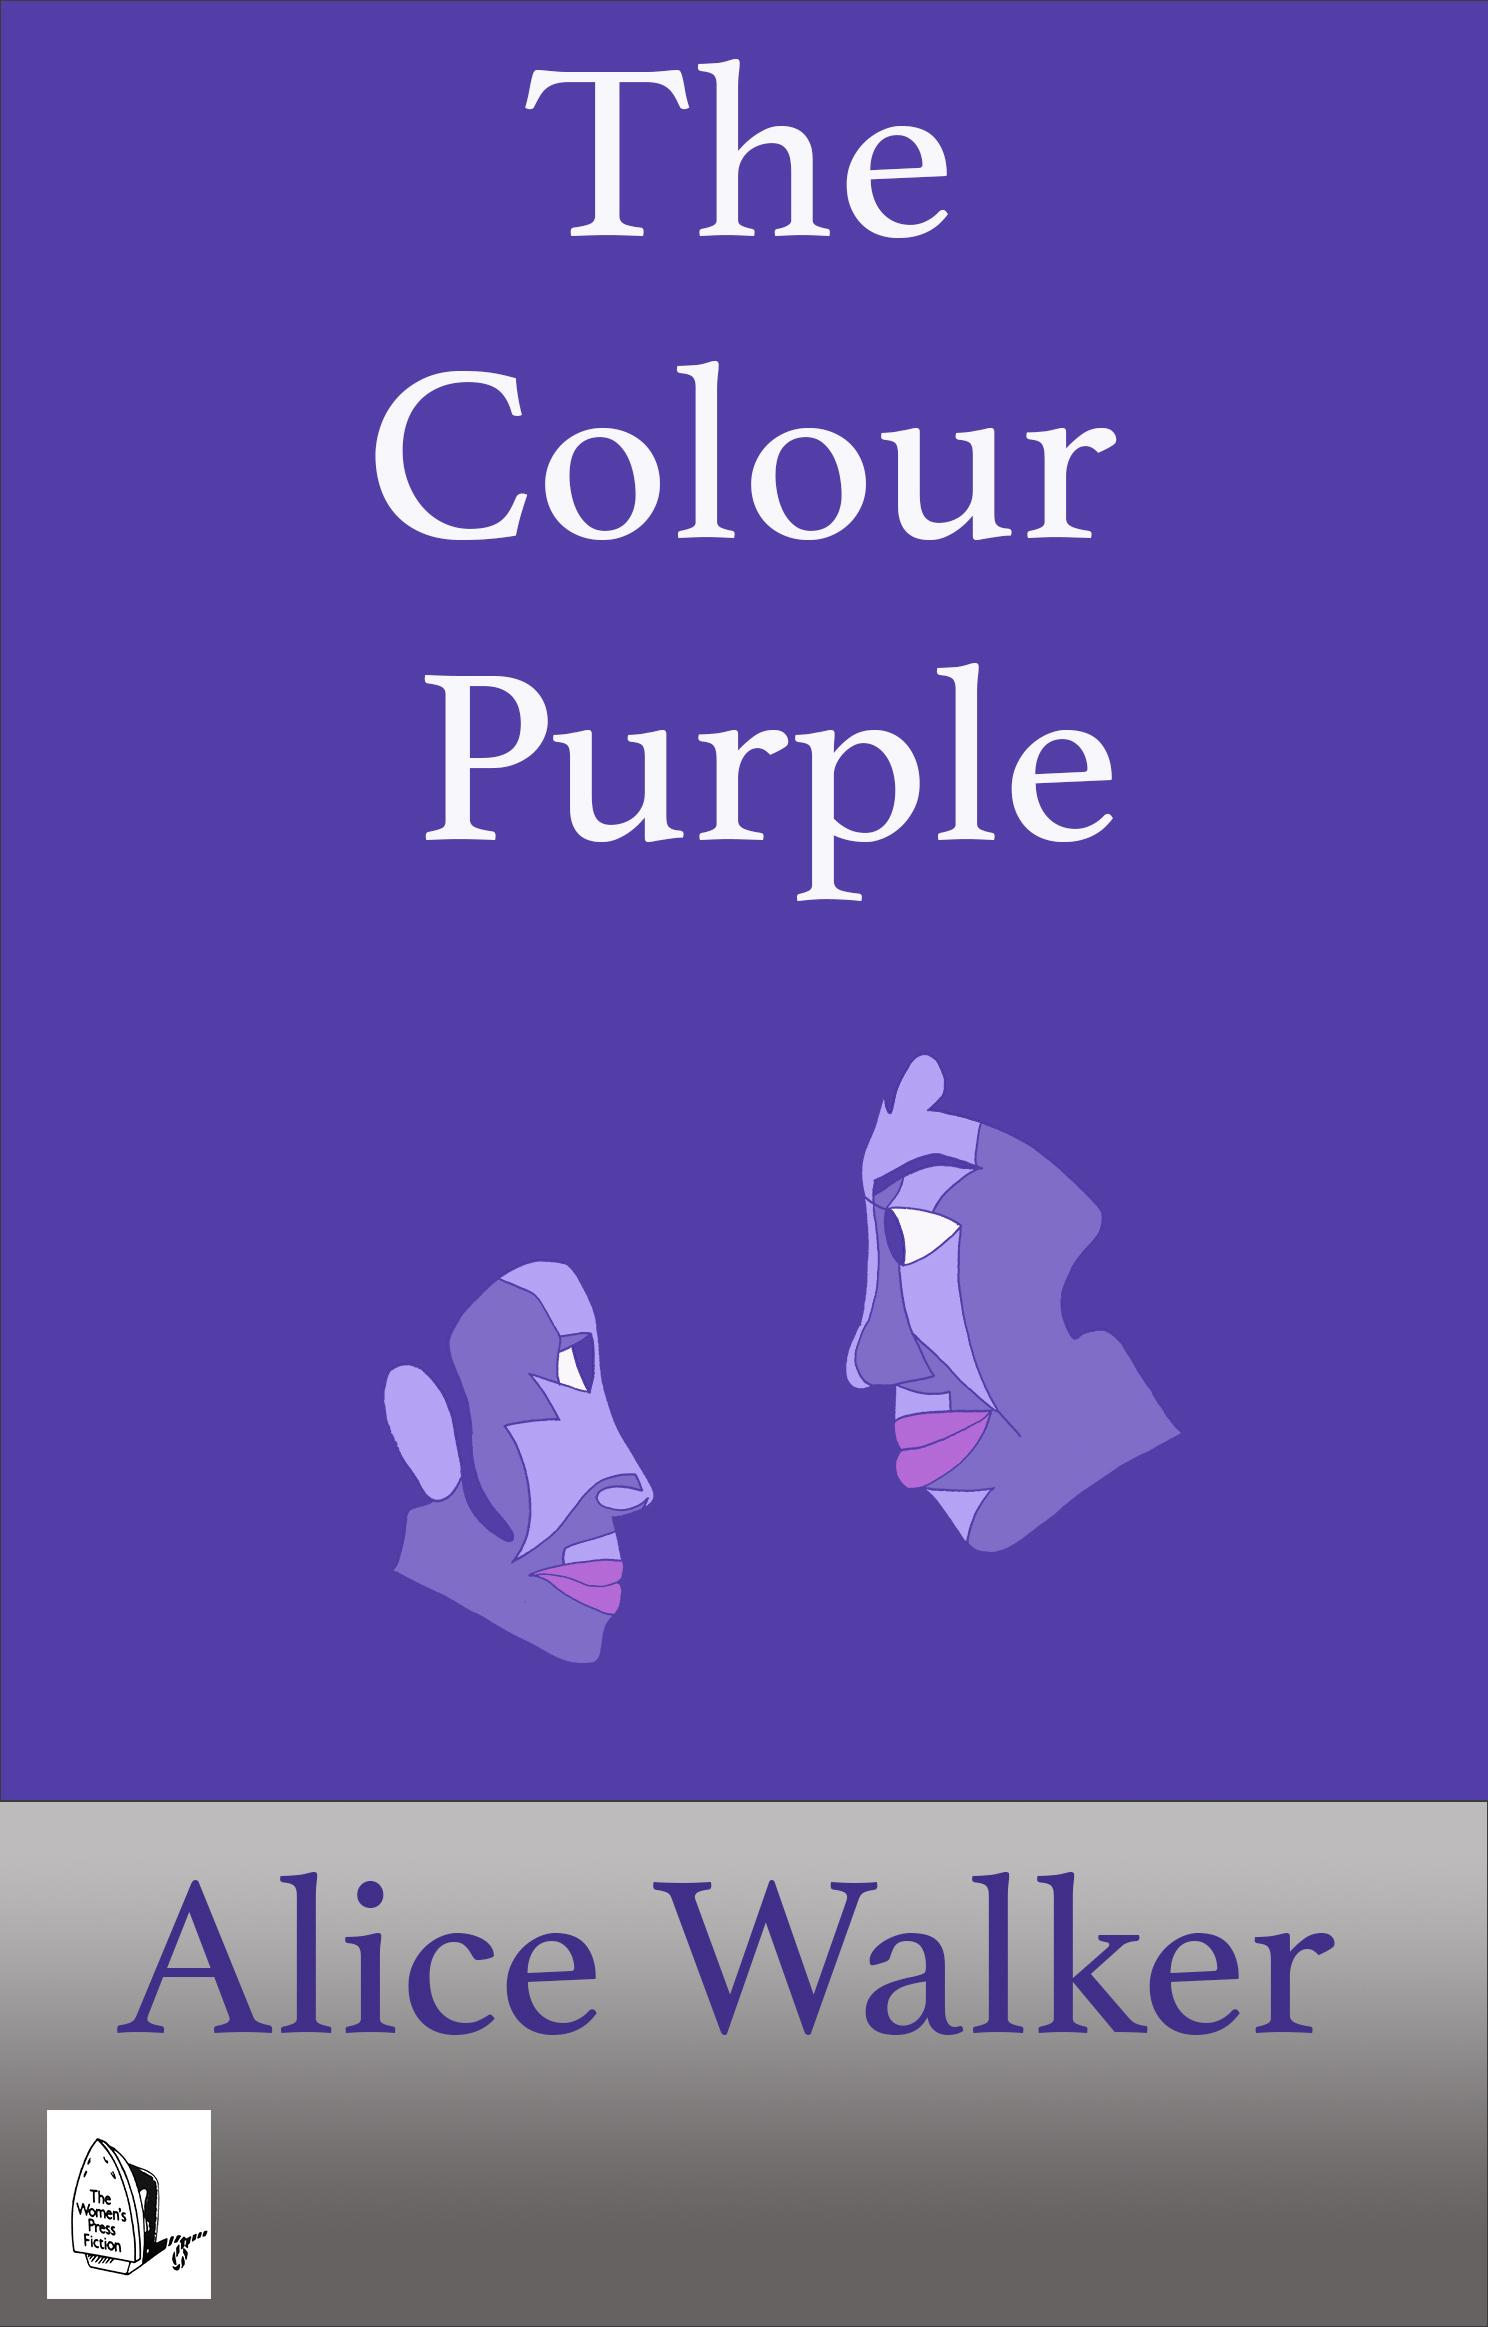 The colour purple cover 6.jpg